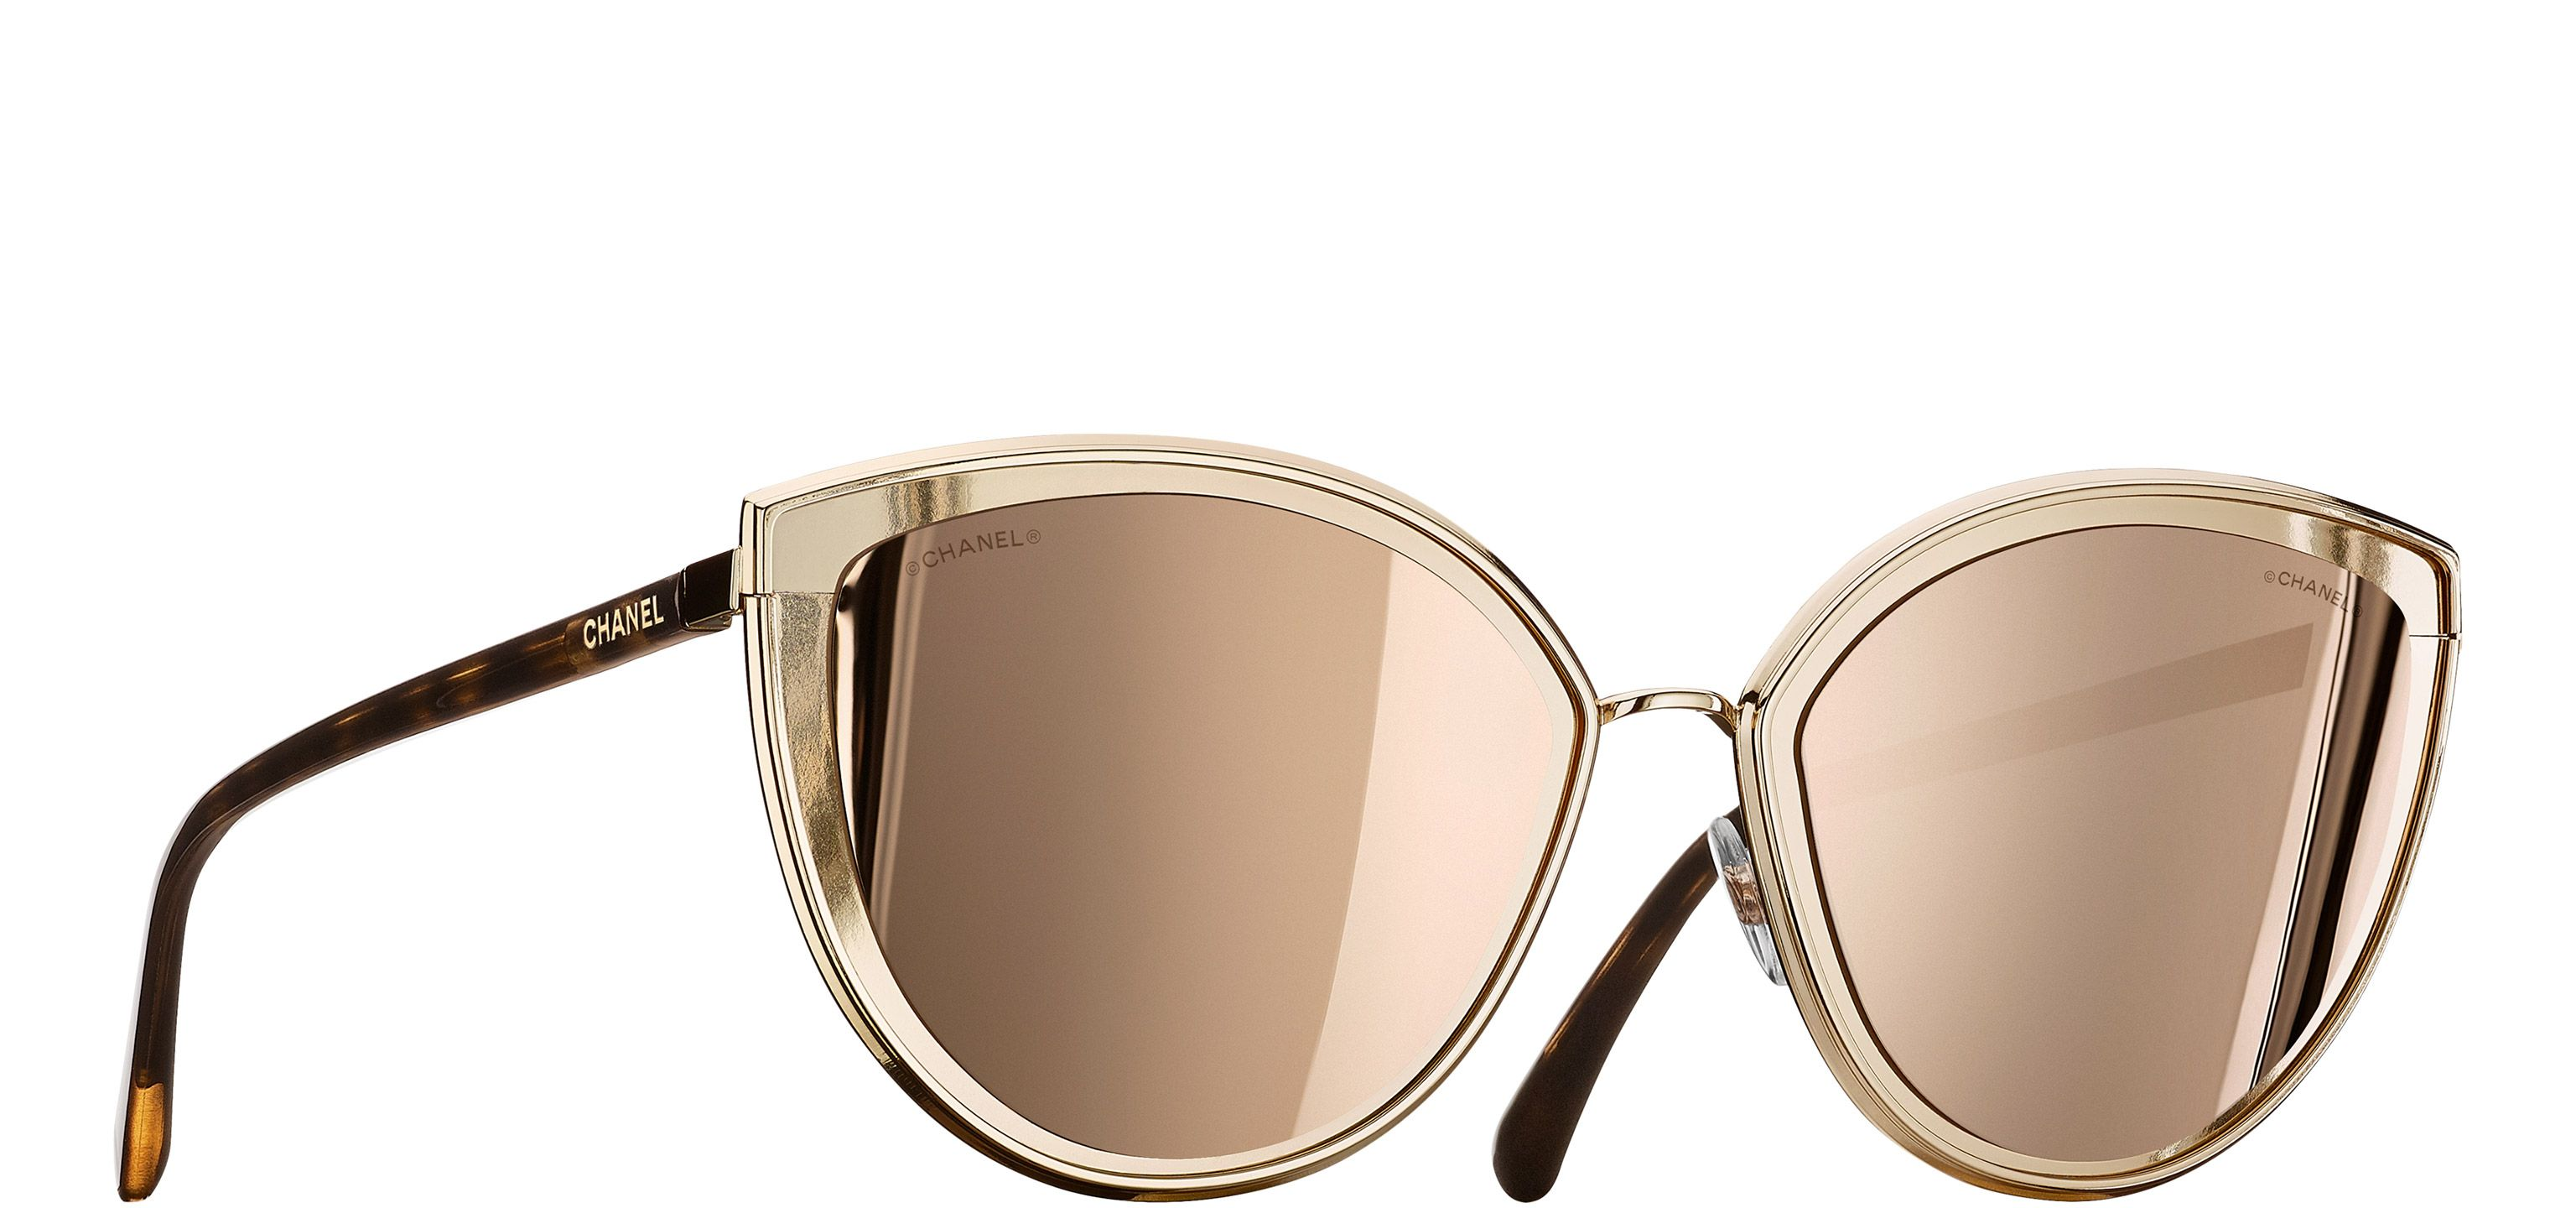 24dc085afe19 www.chanel.com en_US fashion sunglasses images products  Cat-Eye-Summer-Gold-ThreeQuarters A71208L9526 TQ 3072x1440